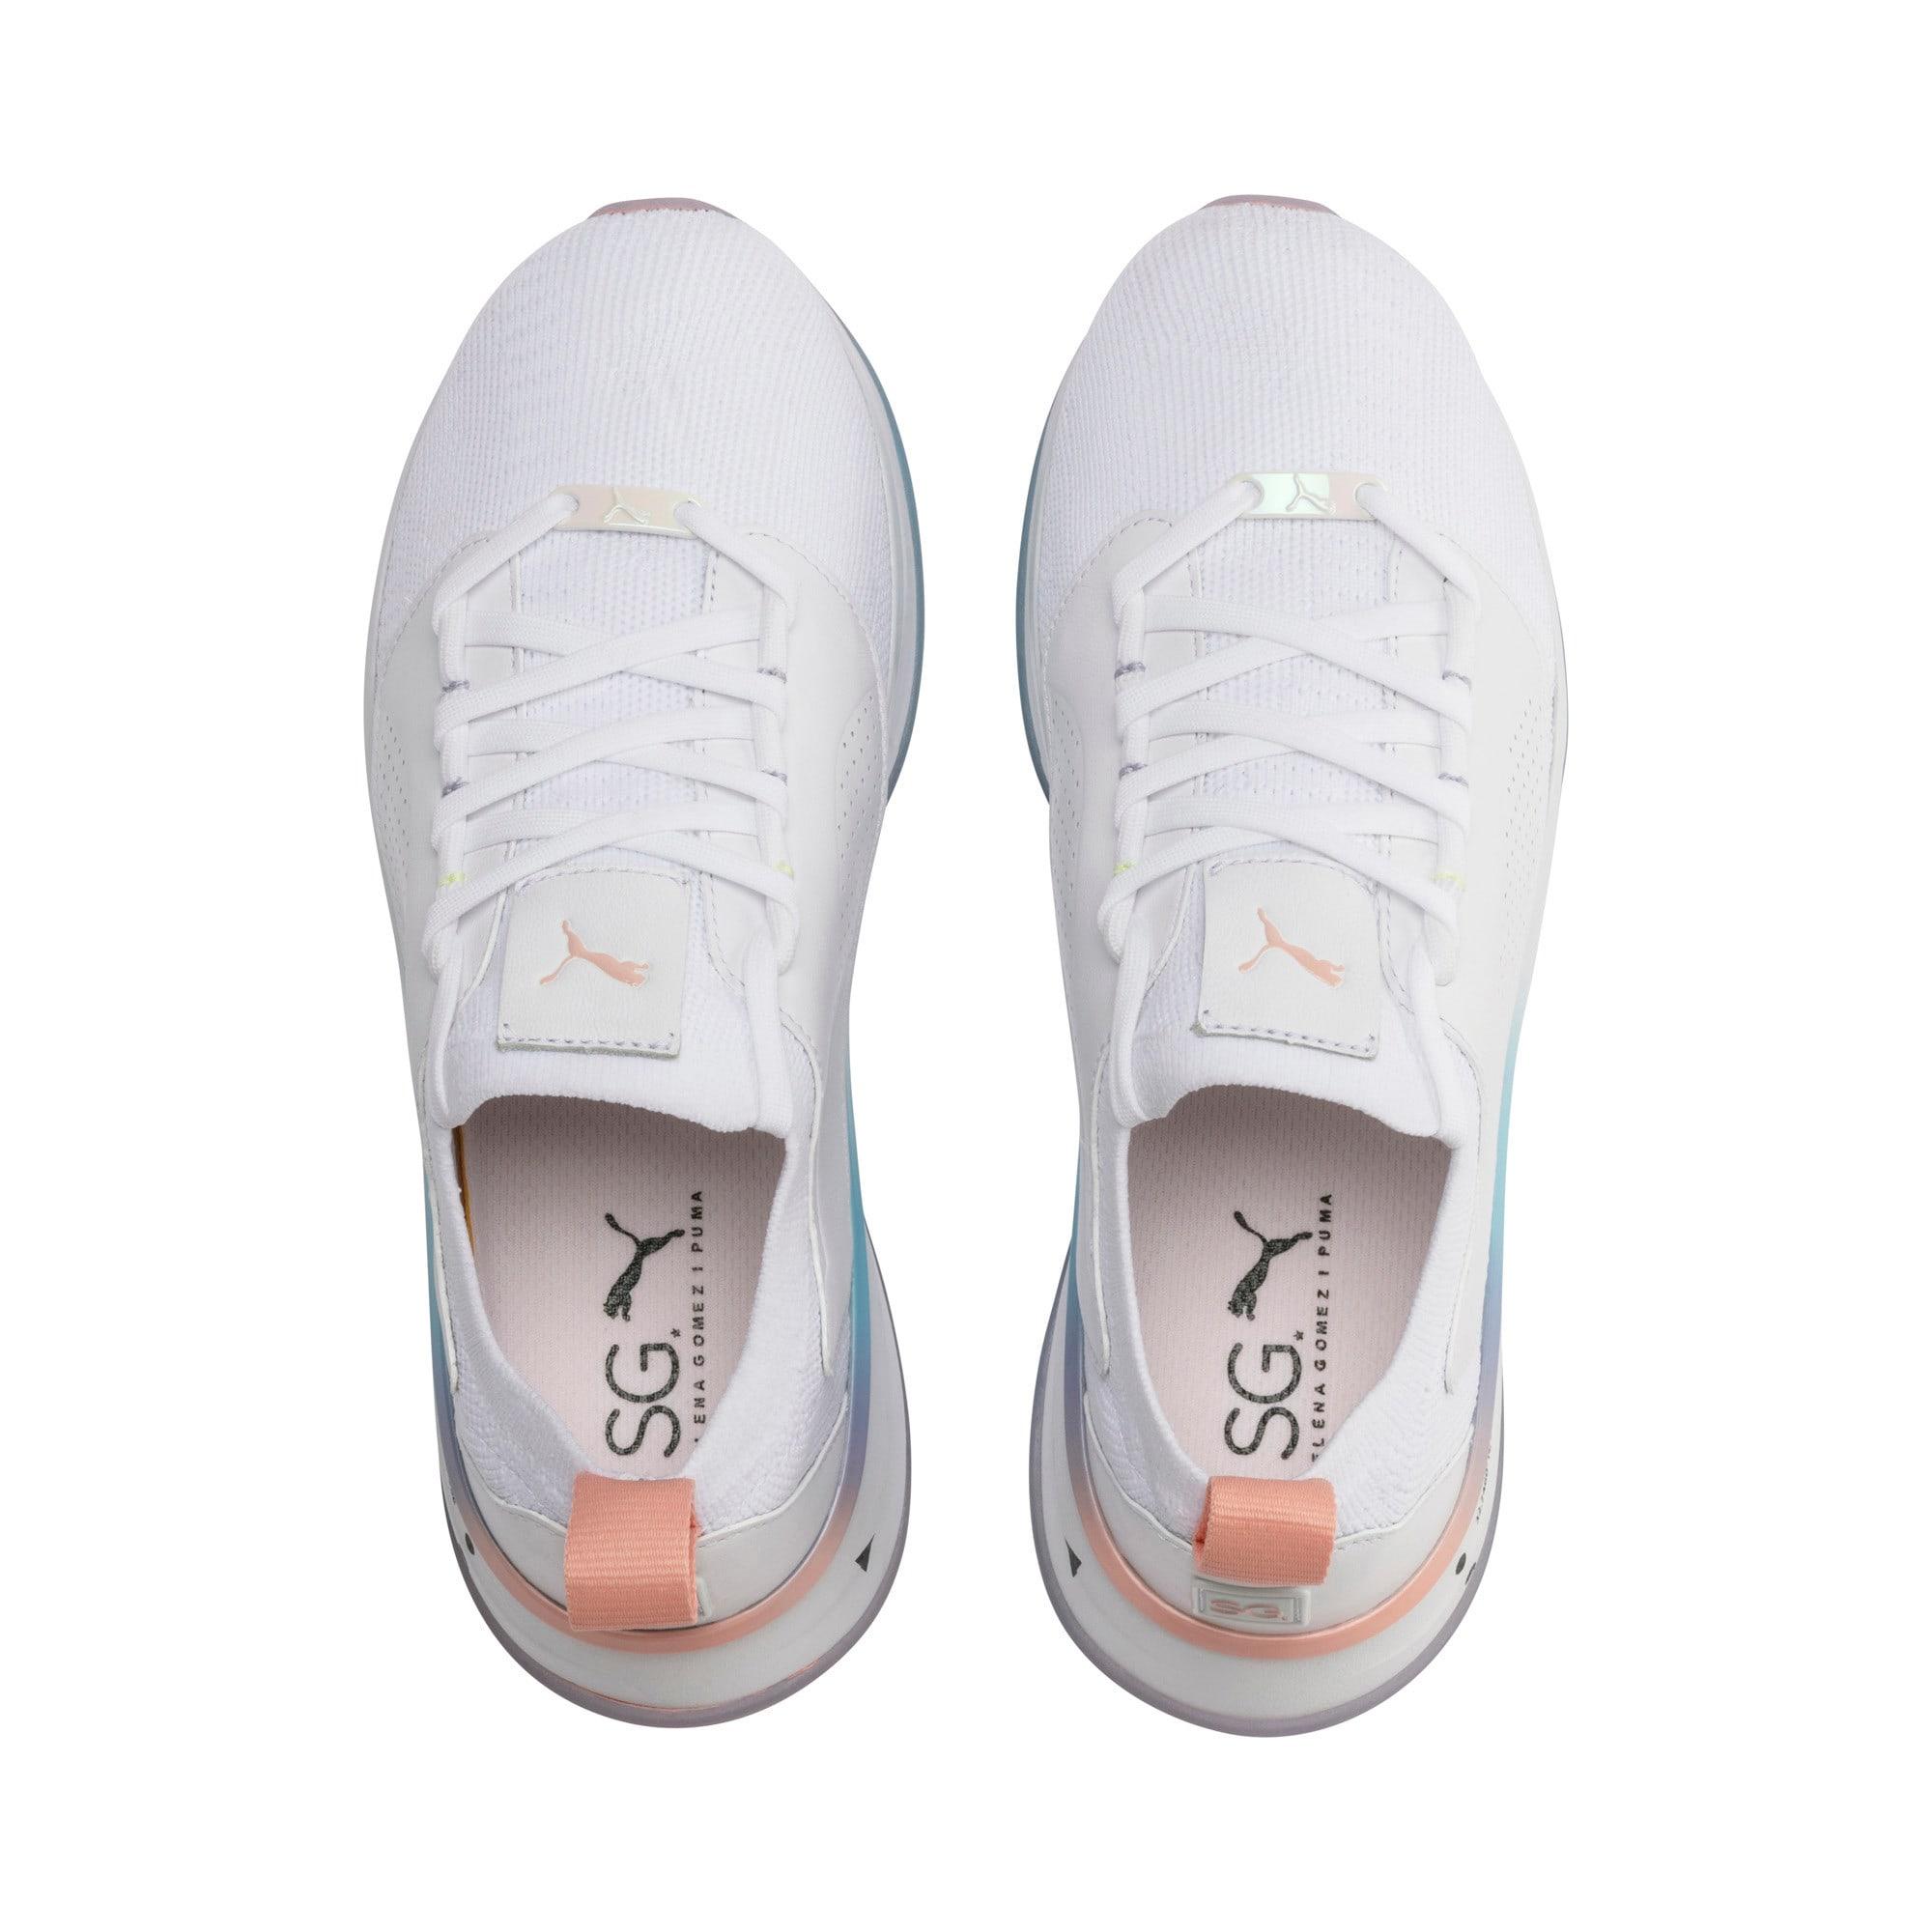 Miniatura 7 de Zapatos de entrenamiento SG Runner Ice para mujer, Puma White-Peach Bud, mediano